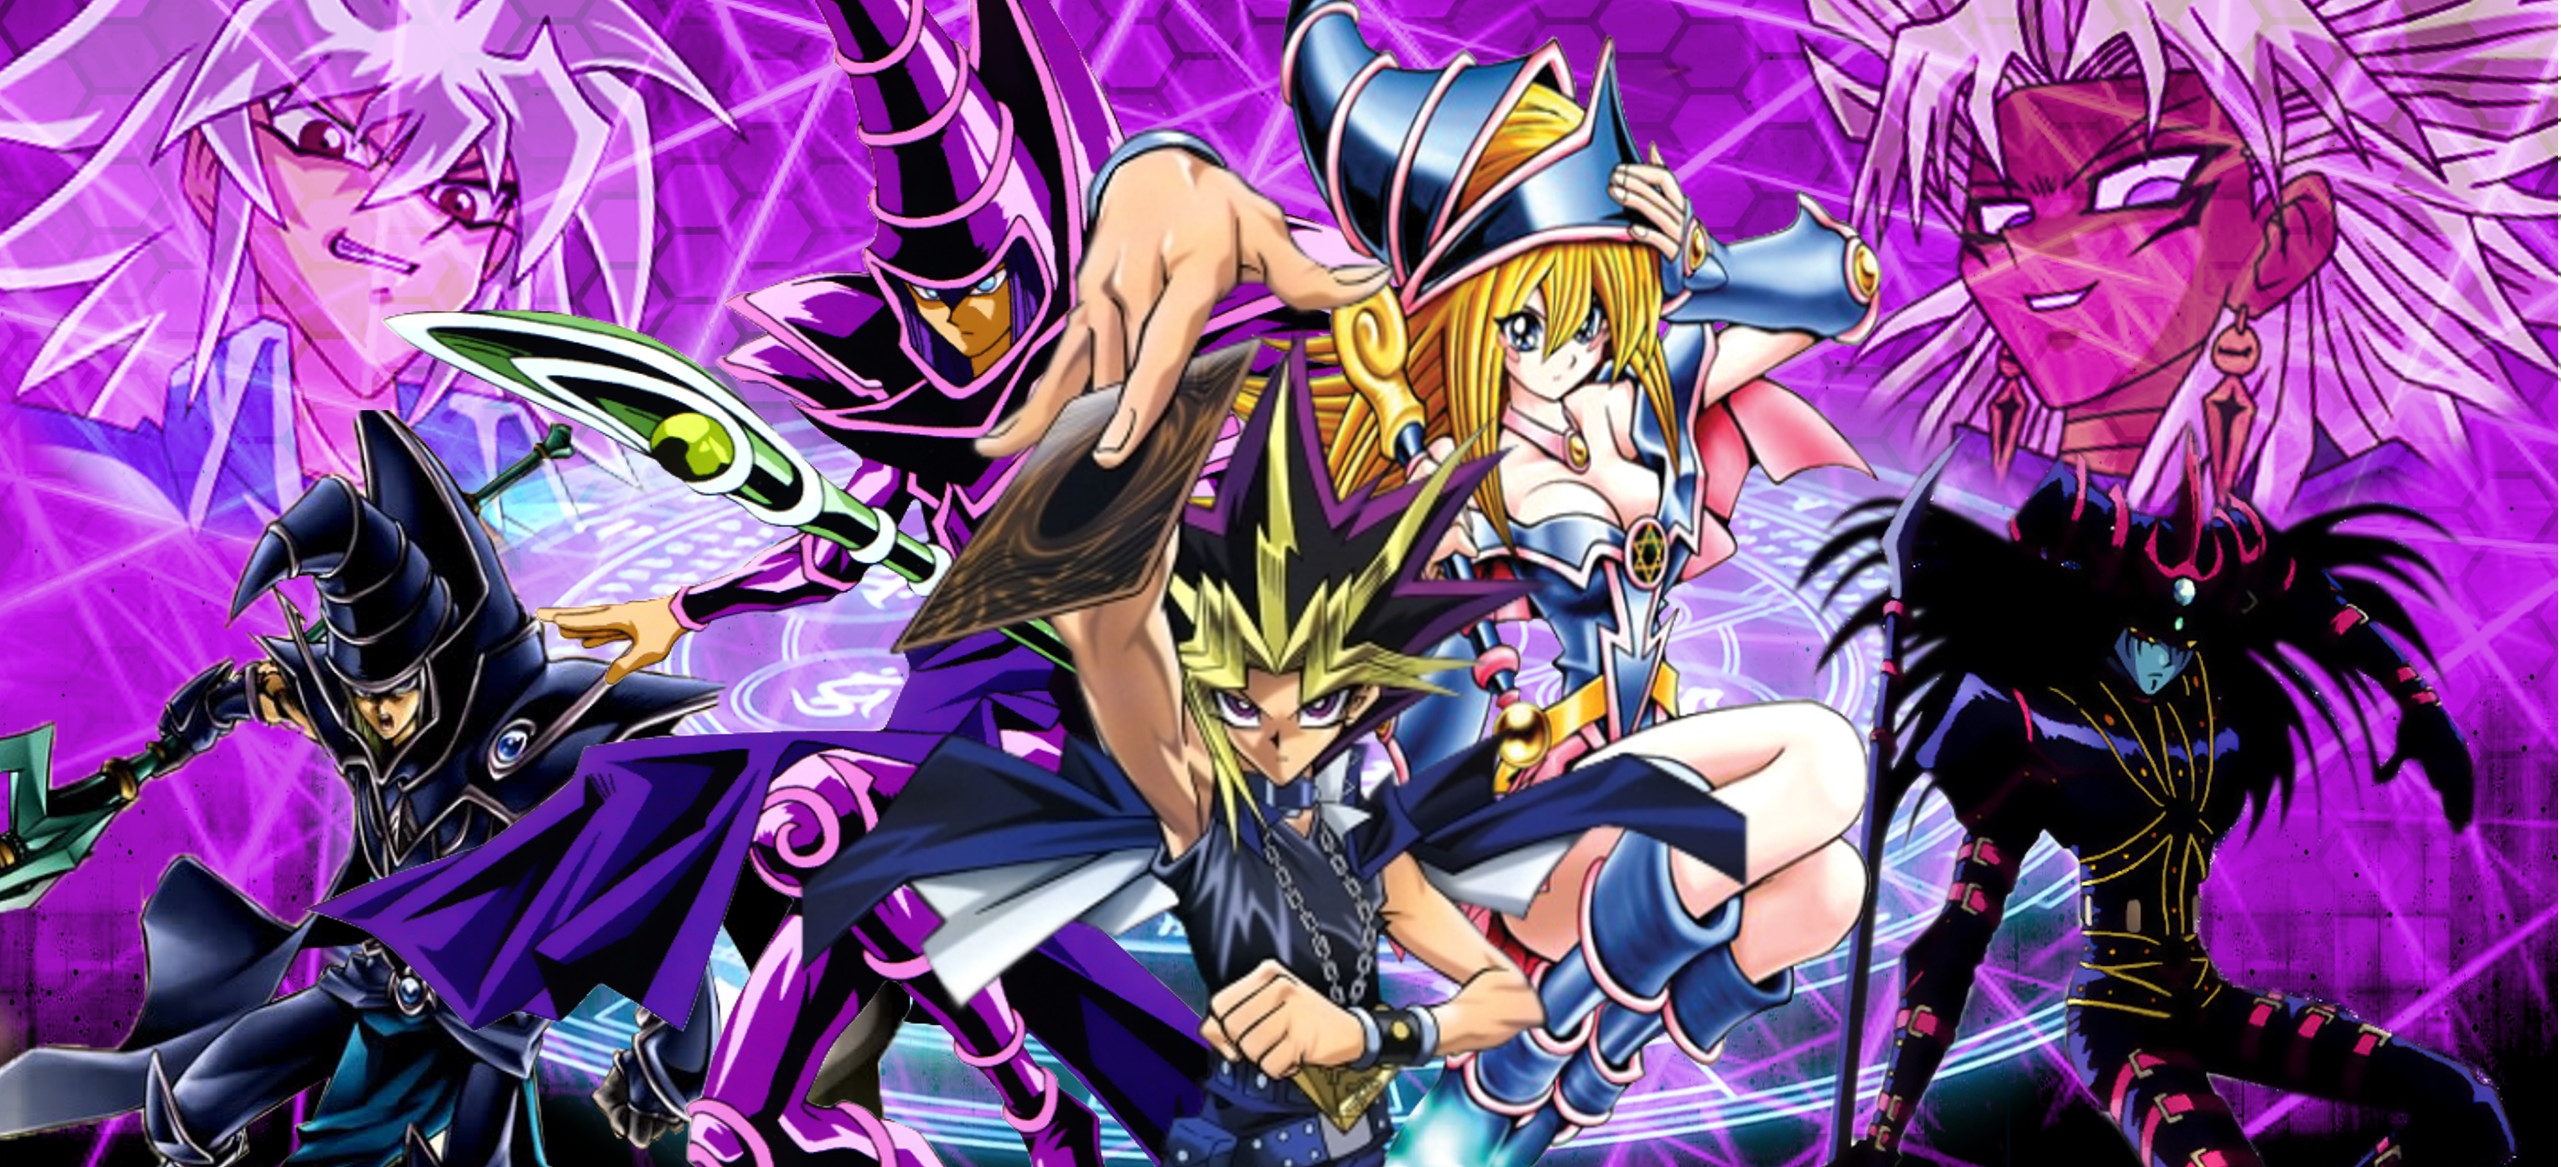 … Yu-Gi-Oh! Spellcaster's Hand by CryoSpear